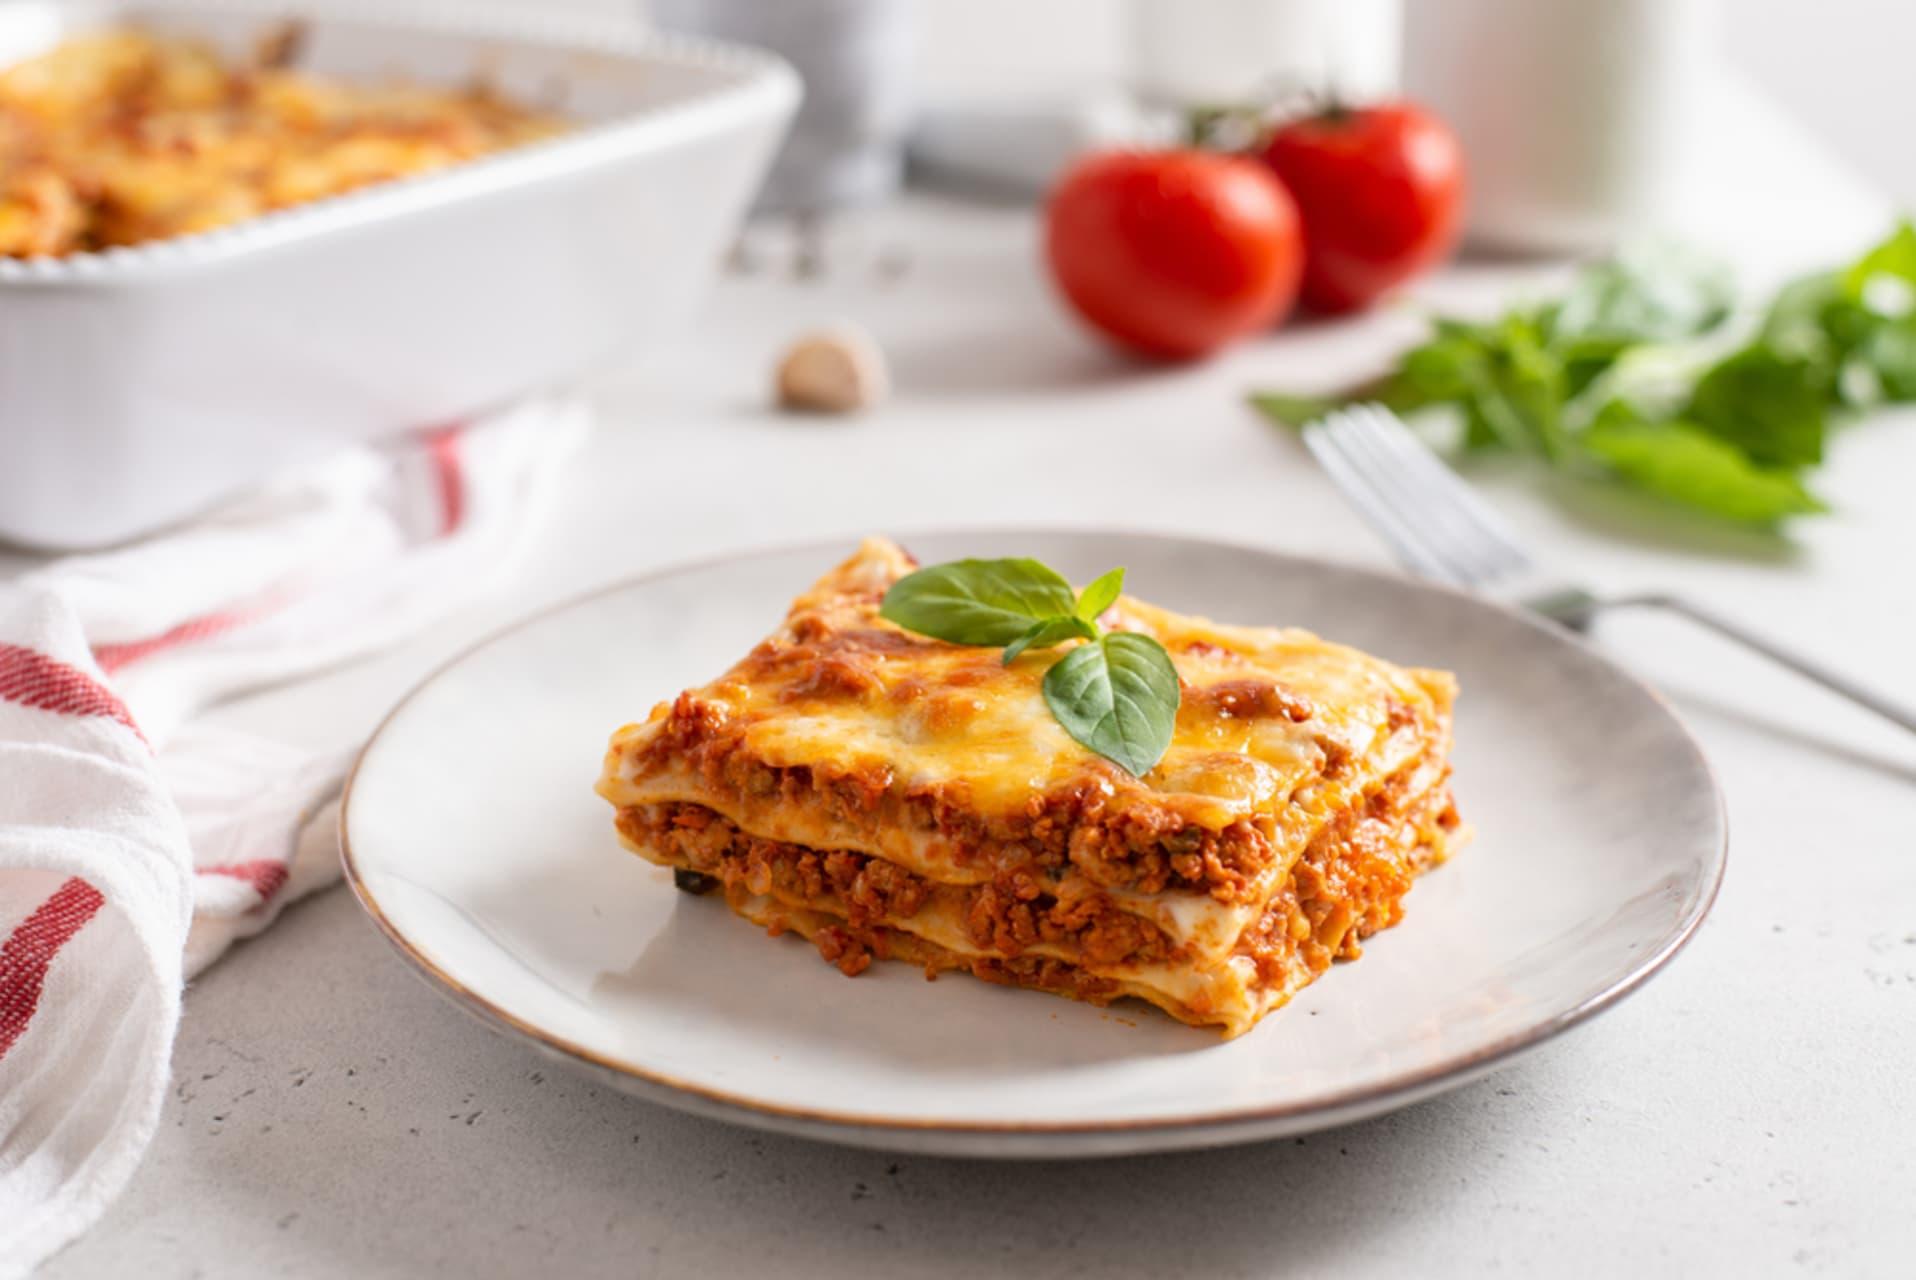 Rome - Lasagna: That's Amore!